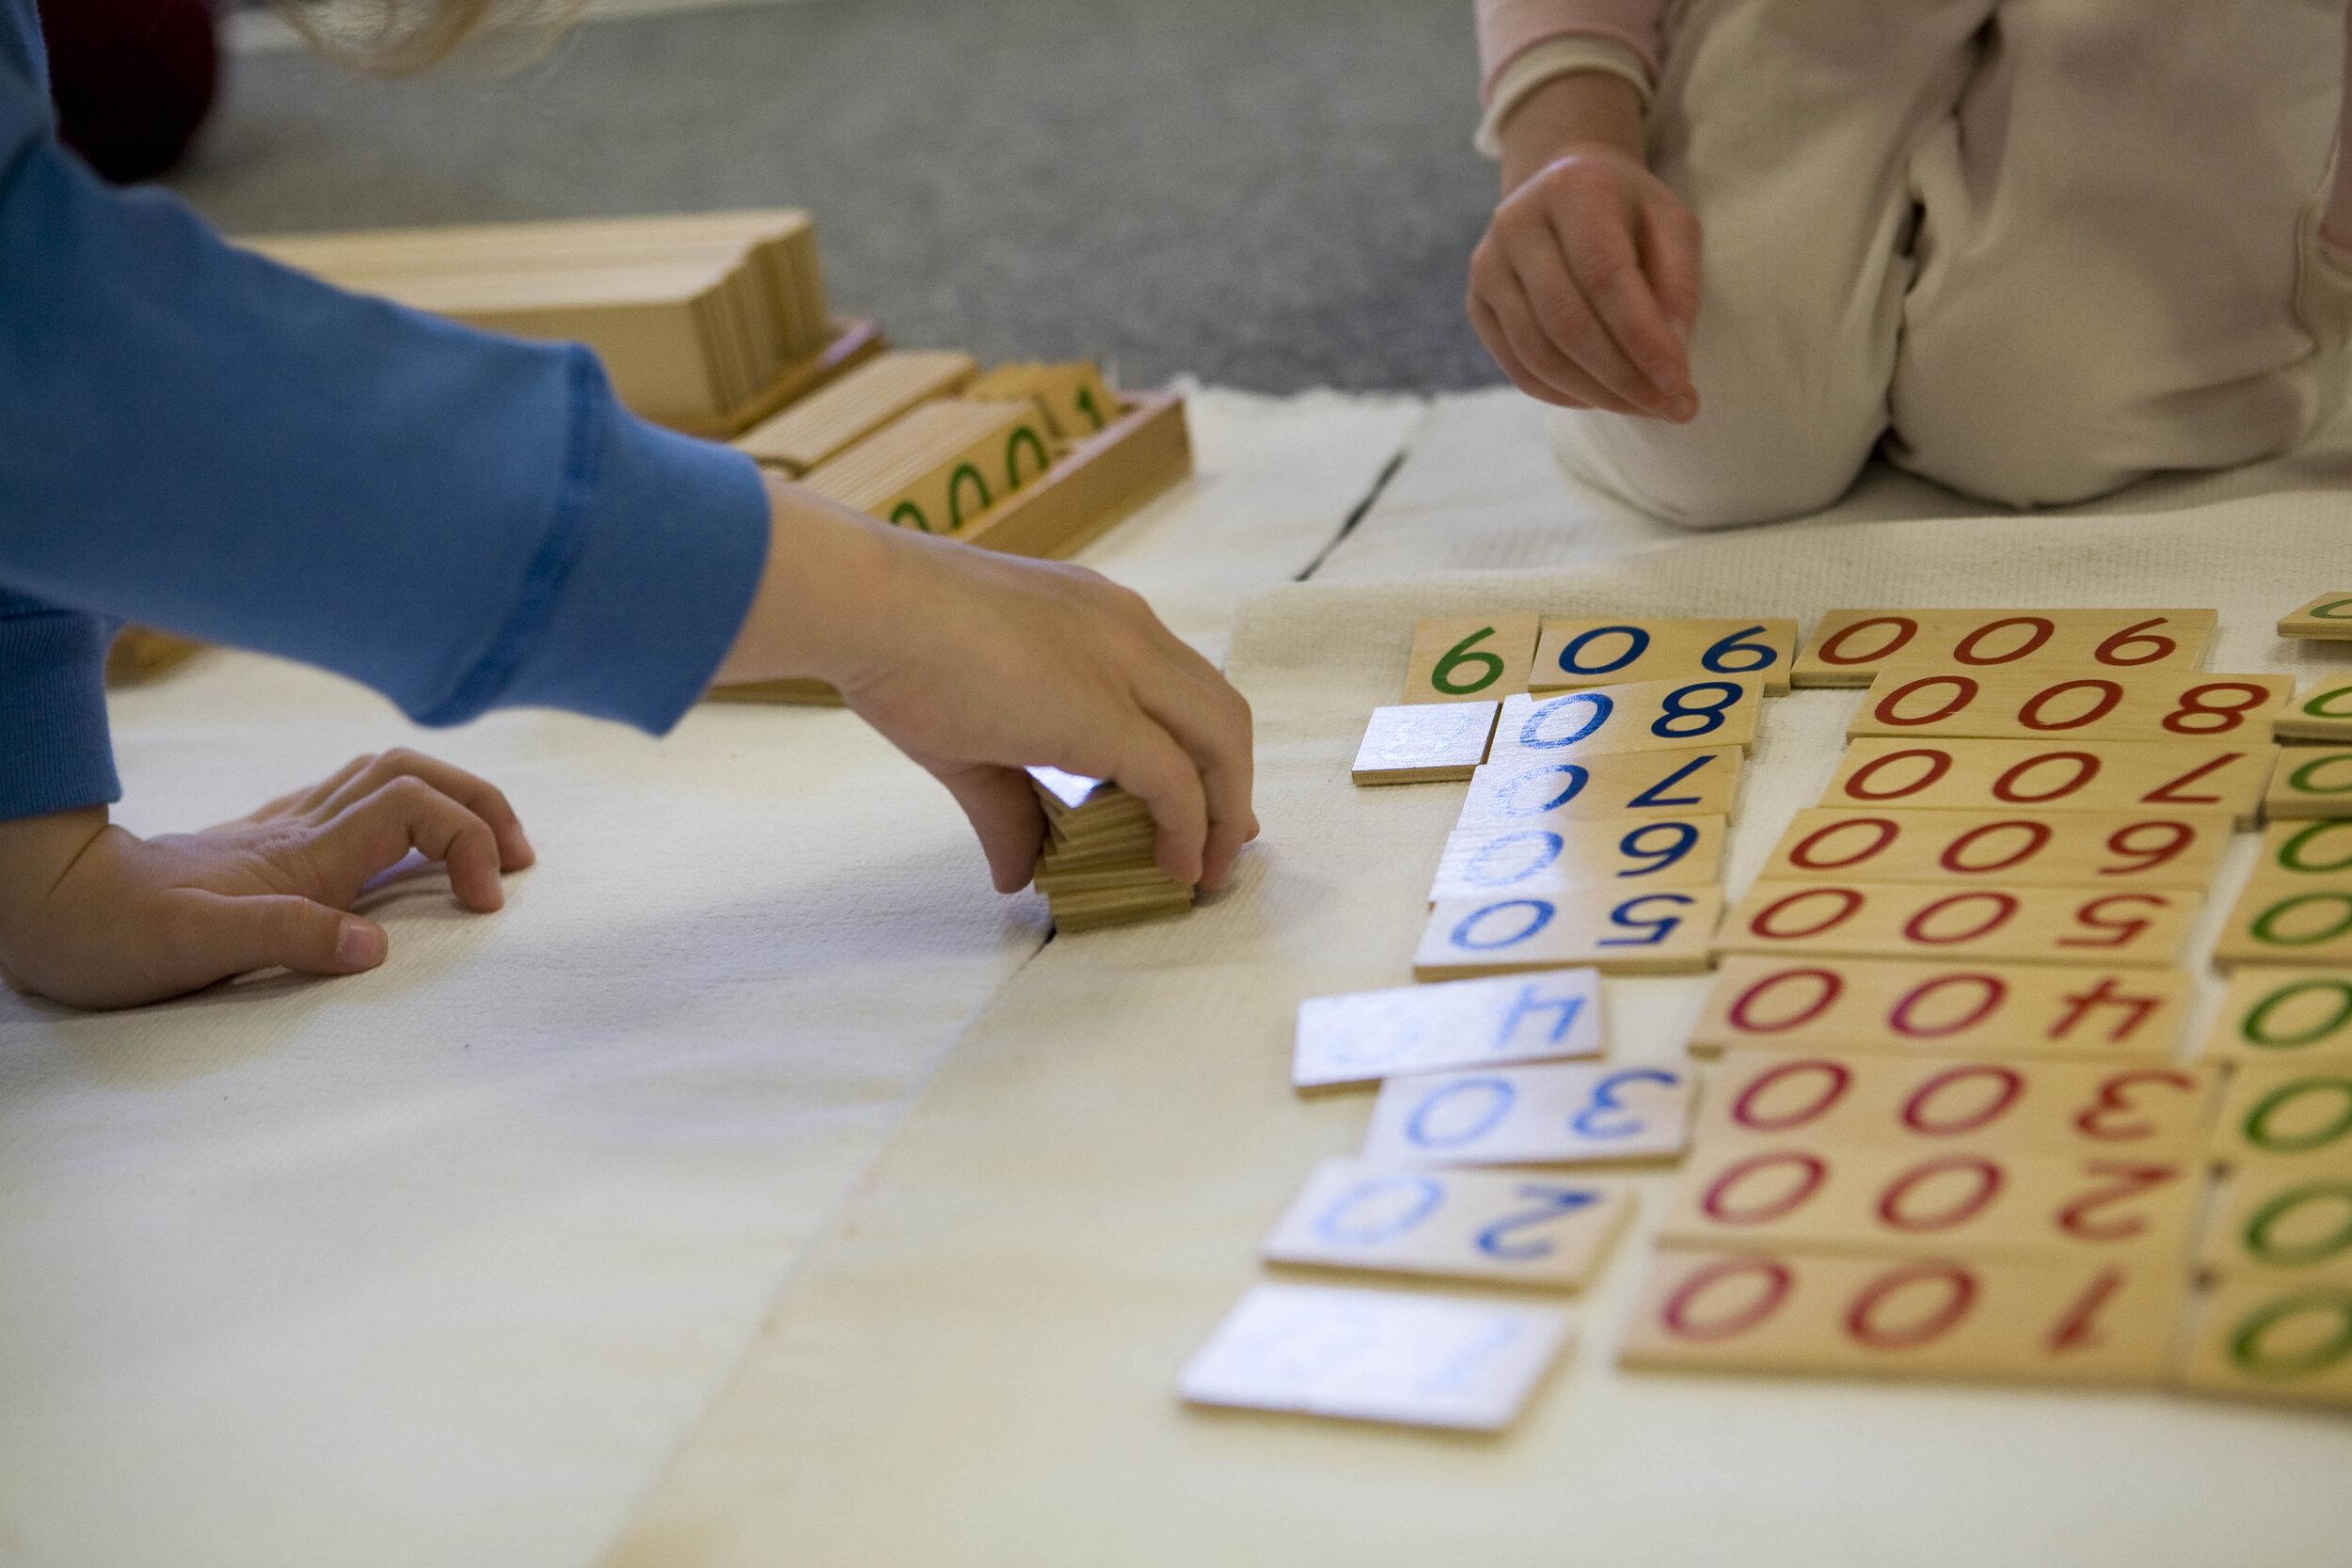 Montessori Counting materials   Source: Thacher Montessori School, WikiCommons